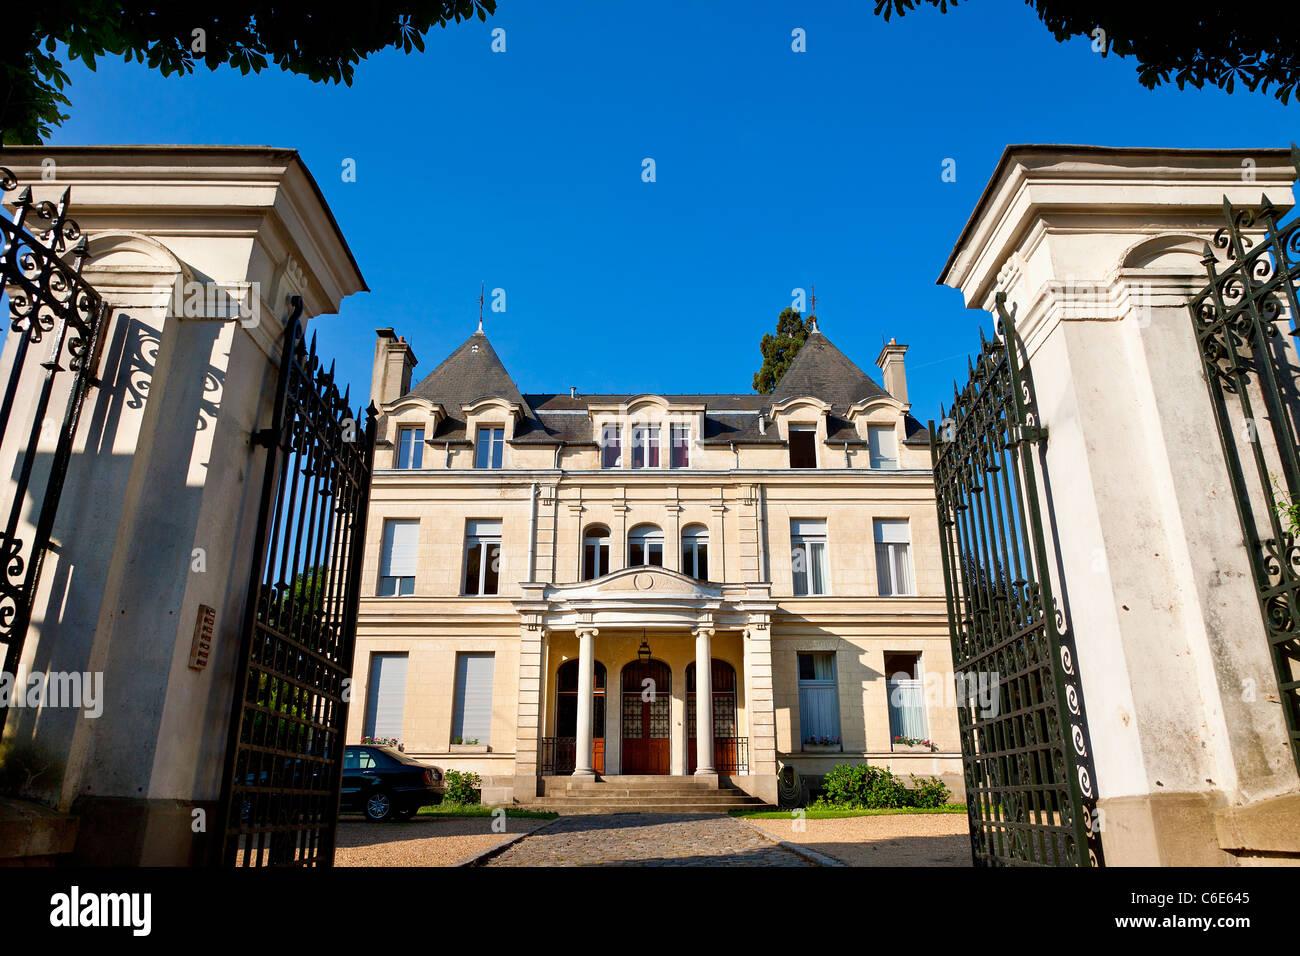 Europa, Francia, Yvelines (78), la vivienda de Rambouillet Imagen De Stock